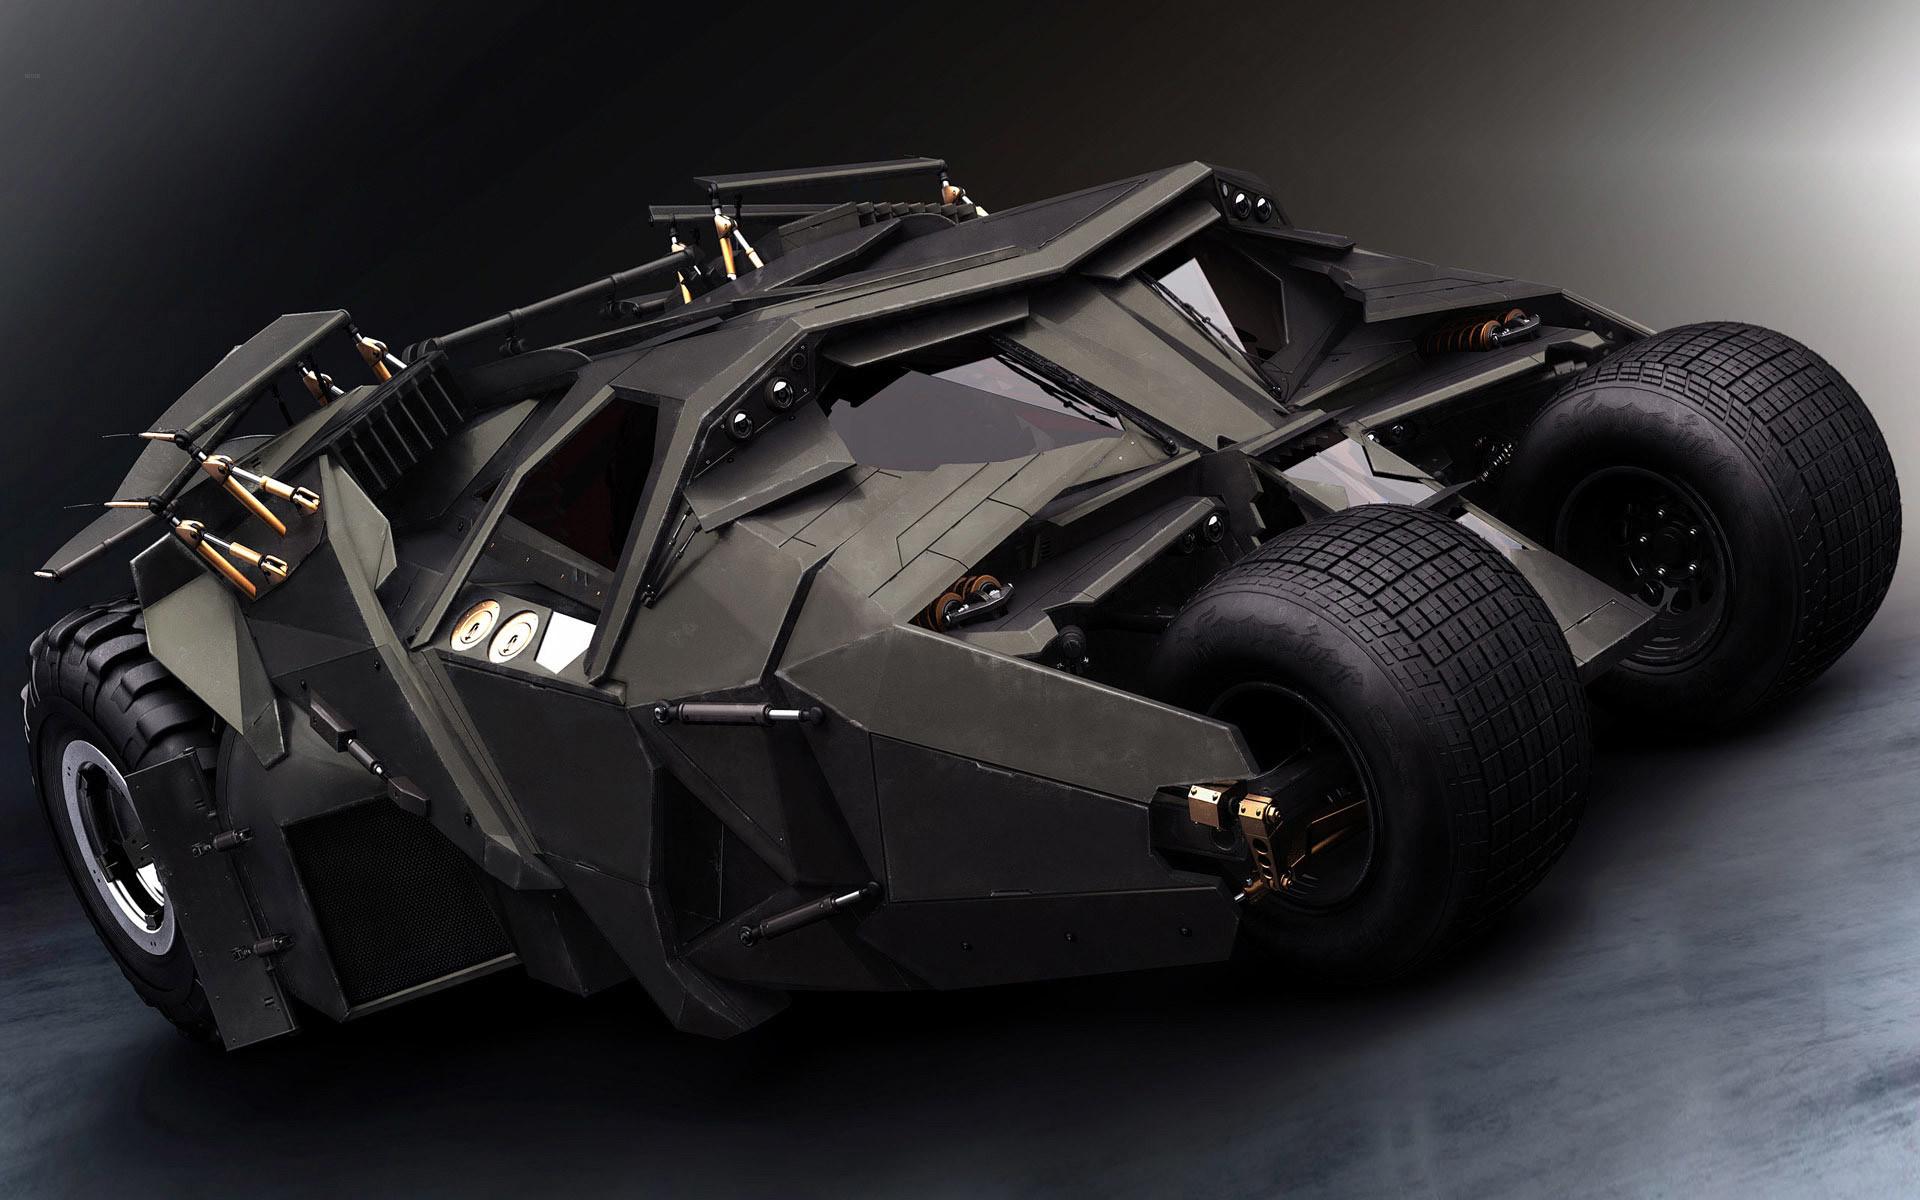 Tumbler in Batman Begins